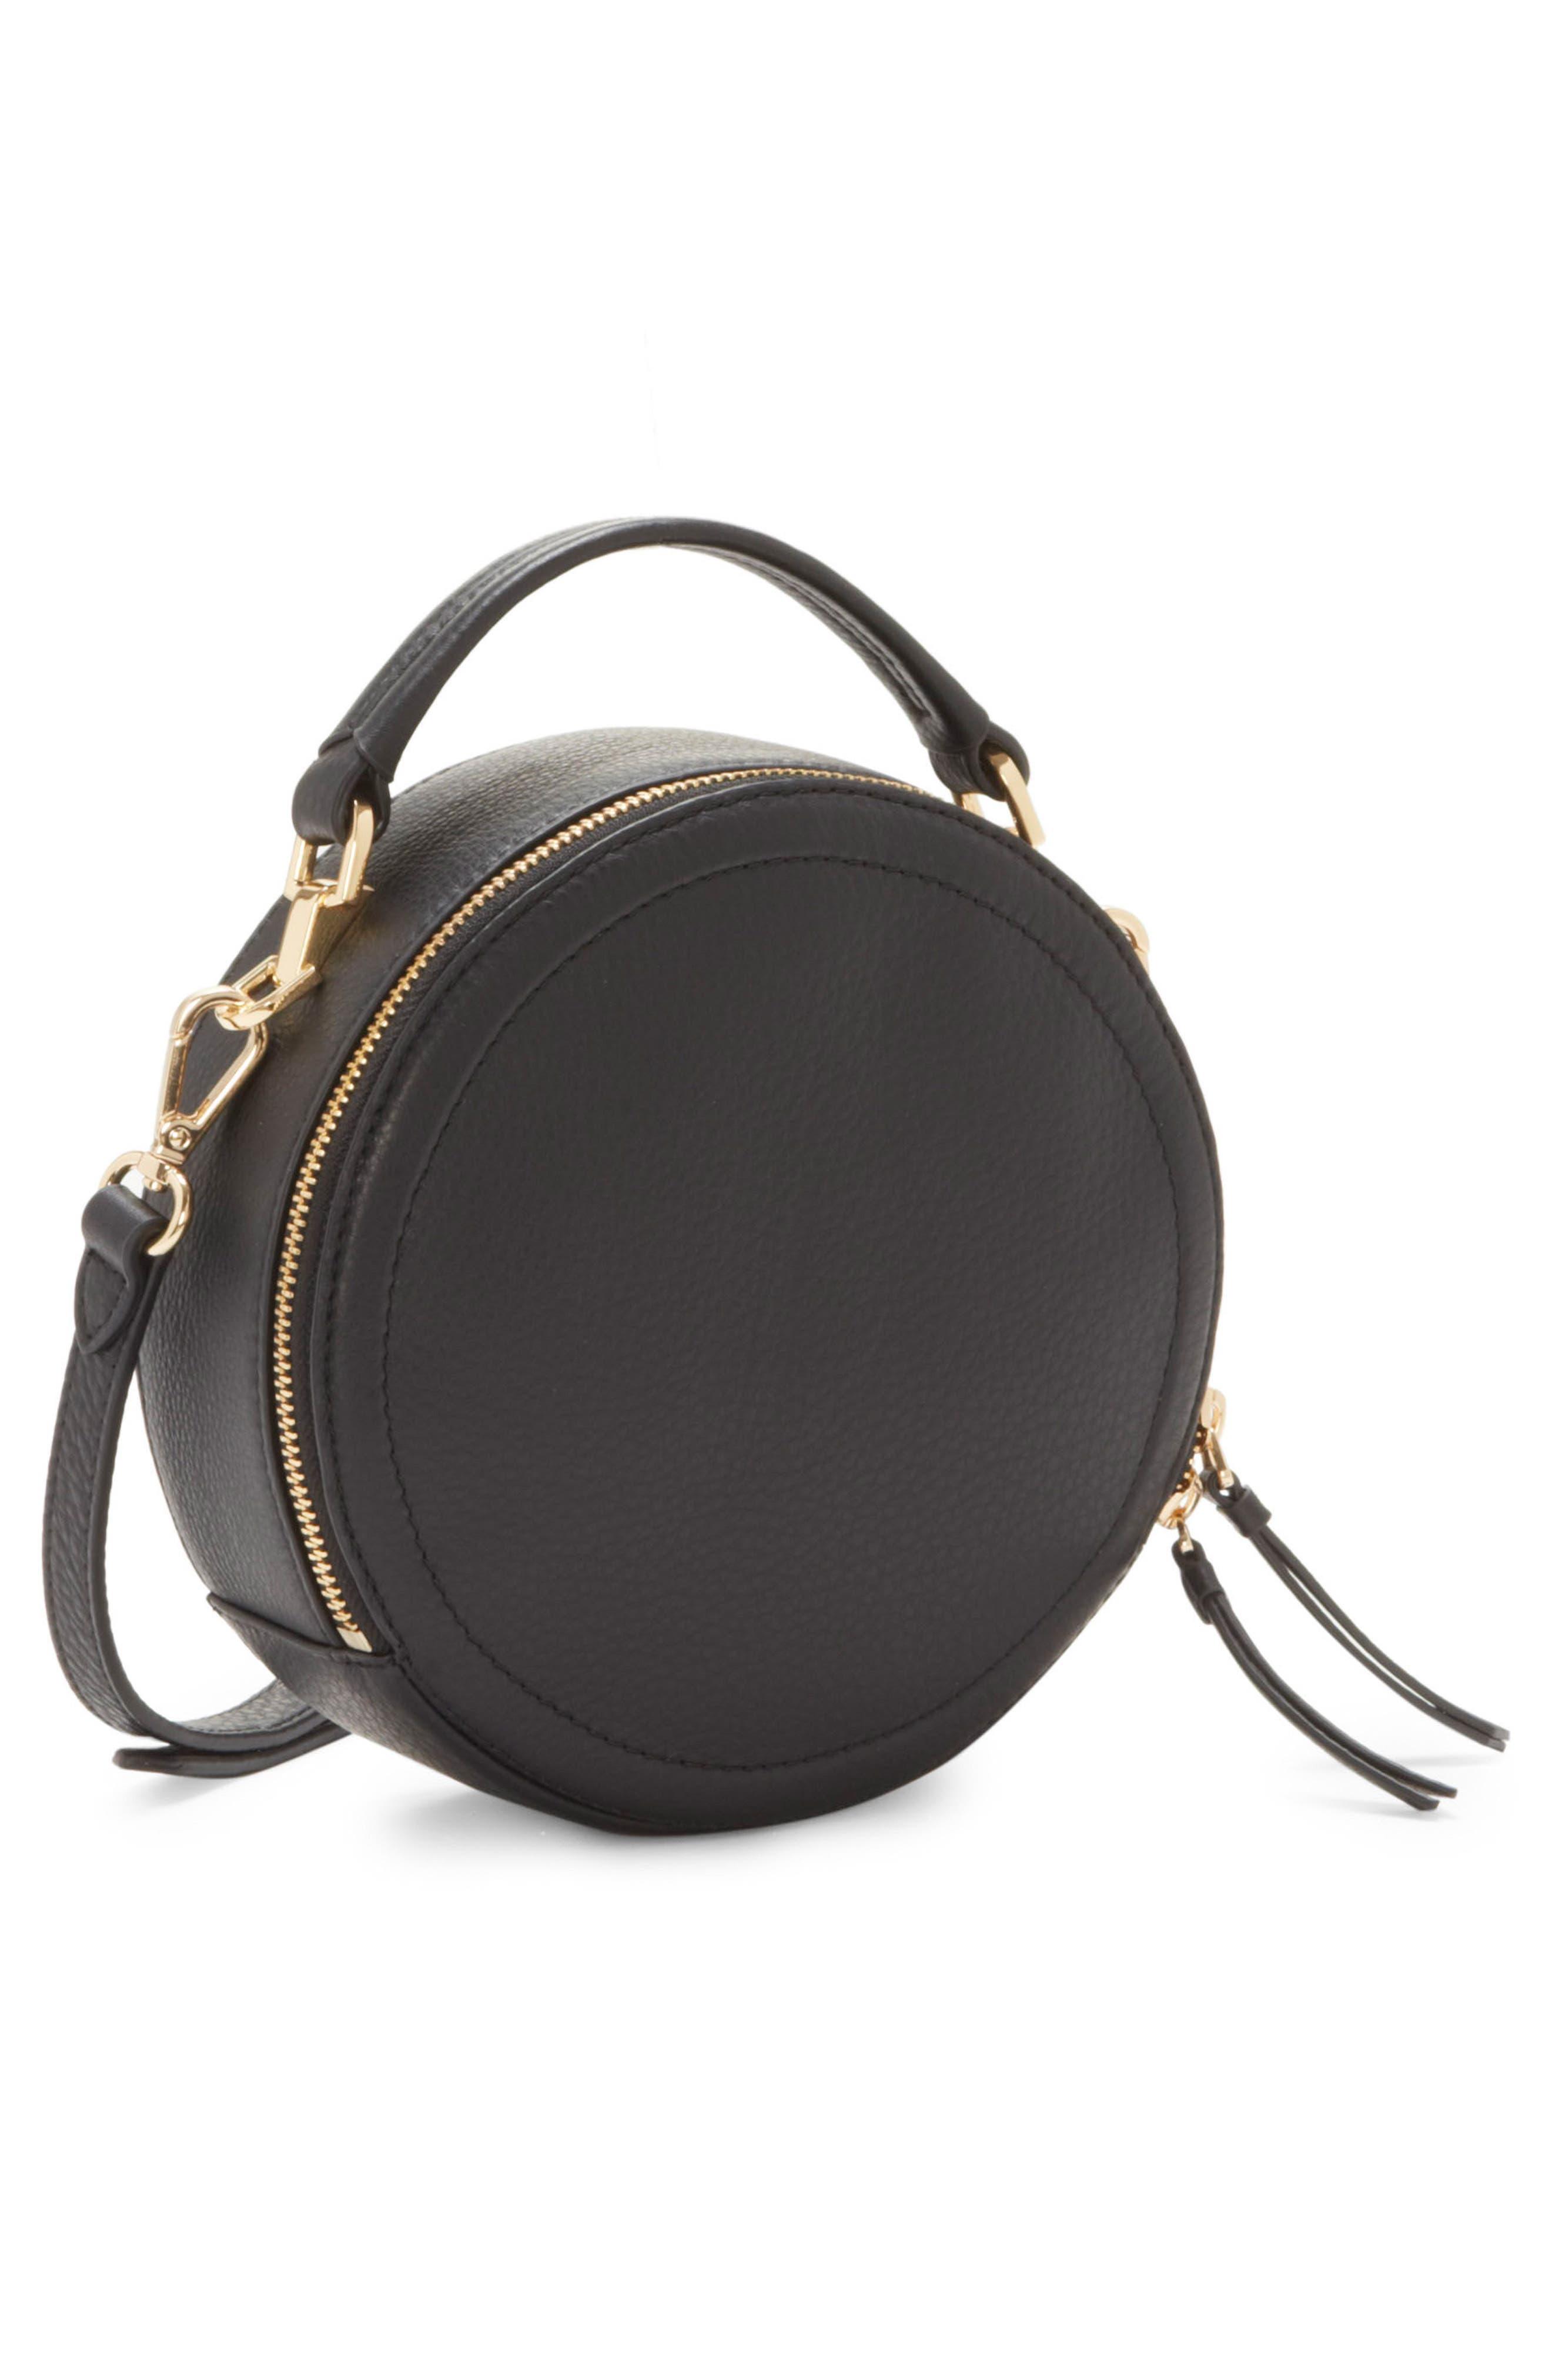 Bray Leather Crossbody Bag,                             Alternate thumbnail 4, color,                             Black